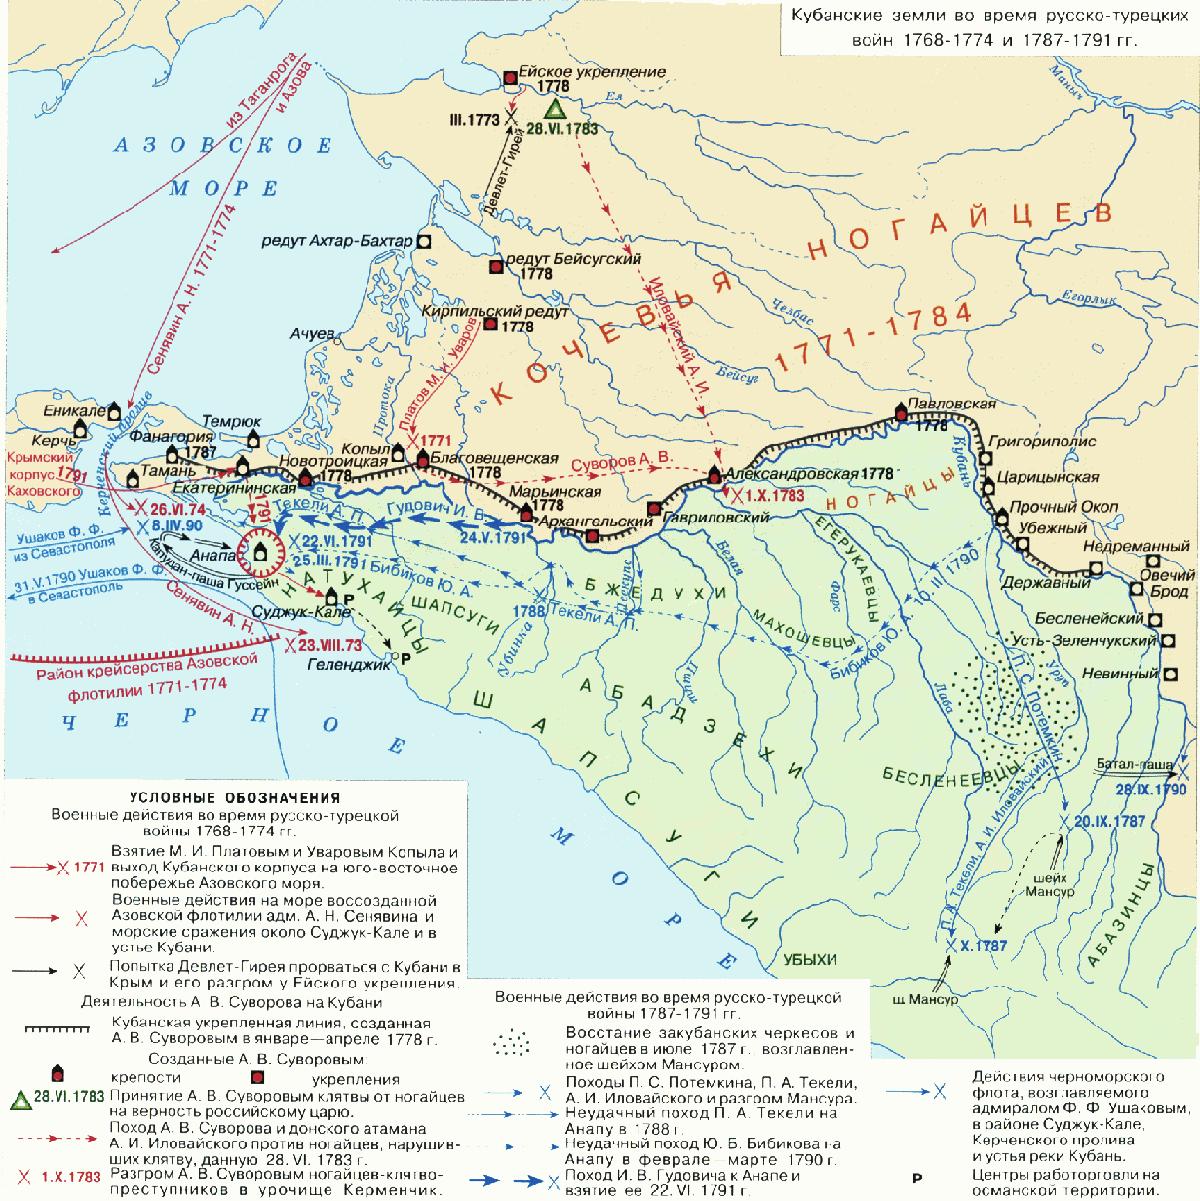 карта походов Суворова,Руменцева и Потемкина Mp_kuban